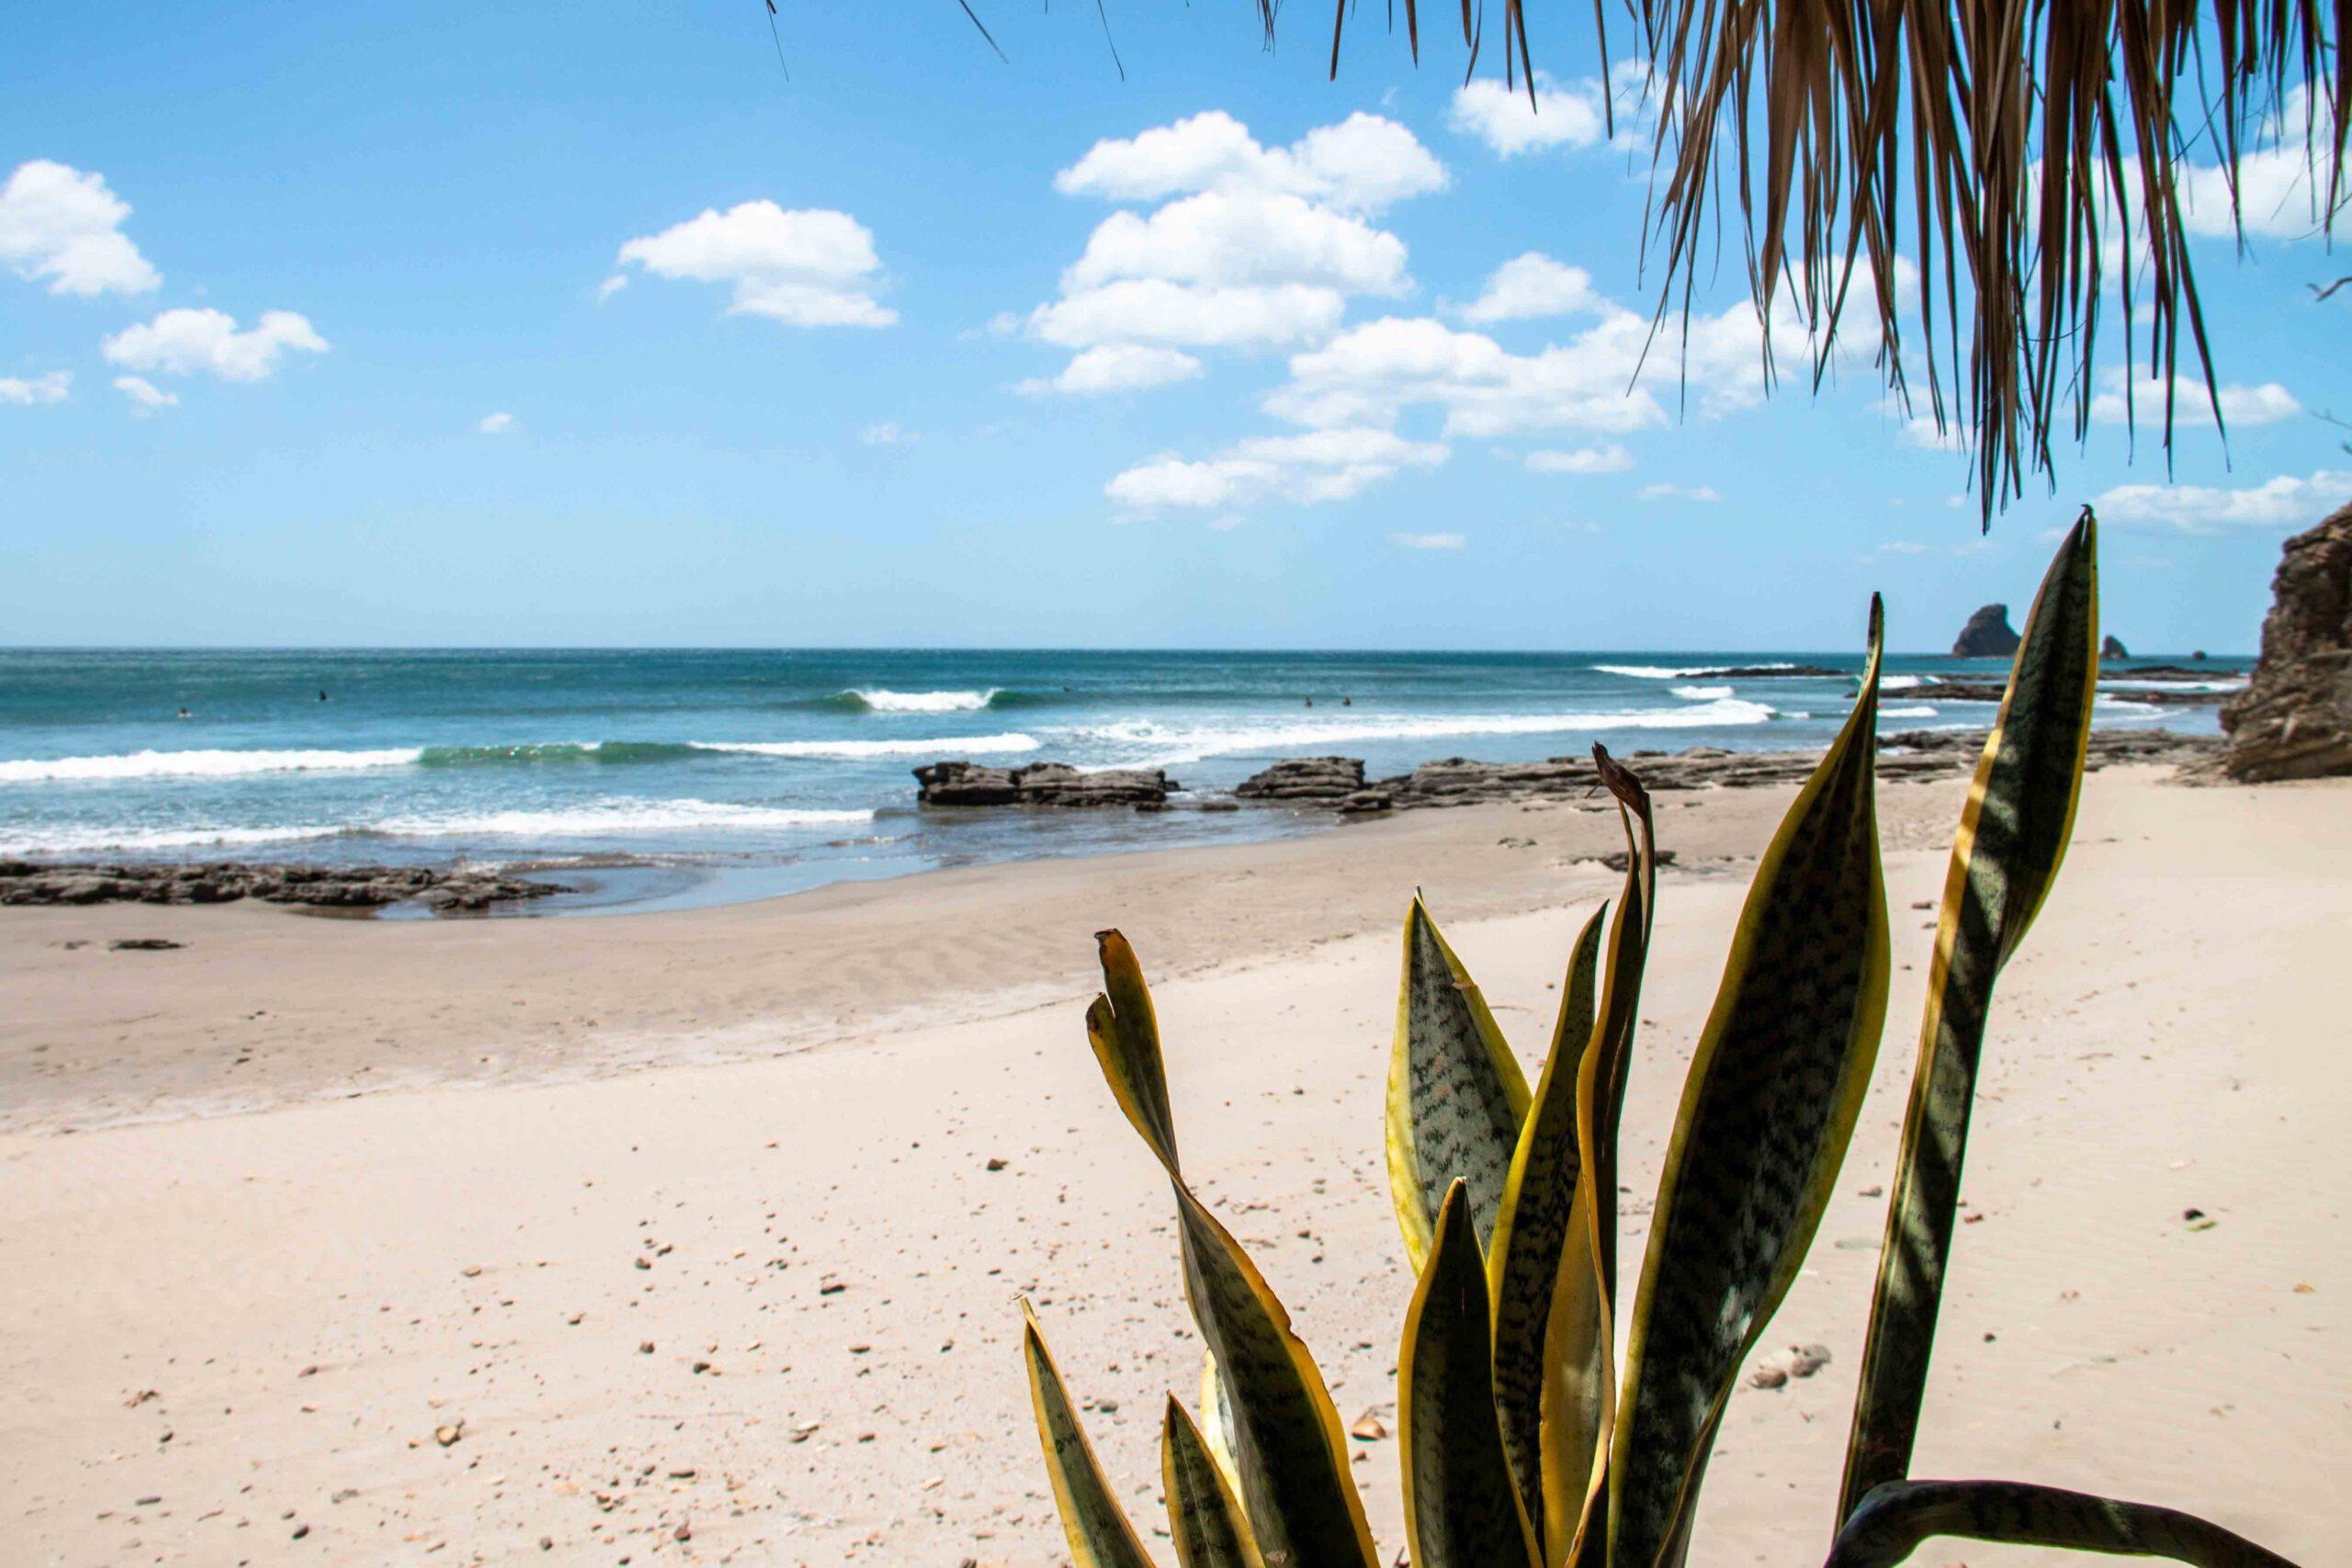 Playa Maderas surf spot in Nicaragua